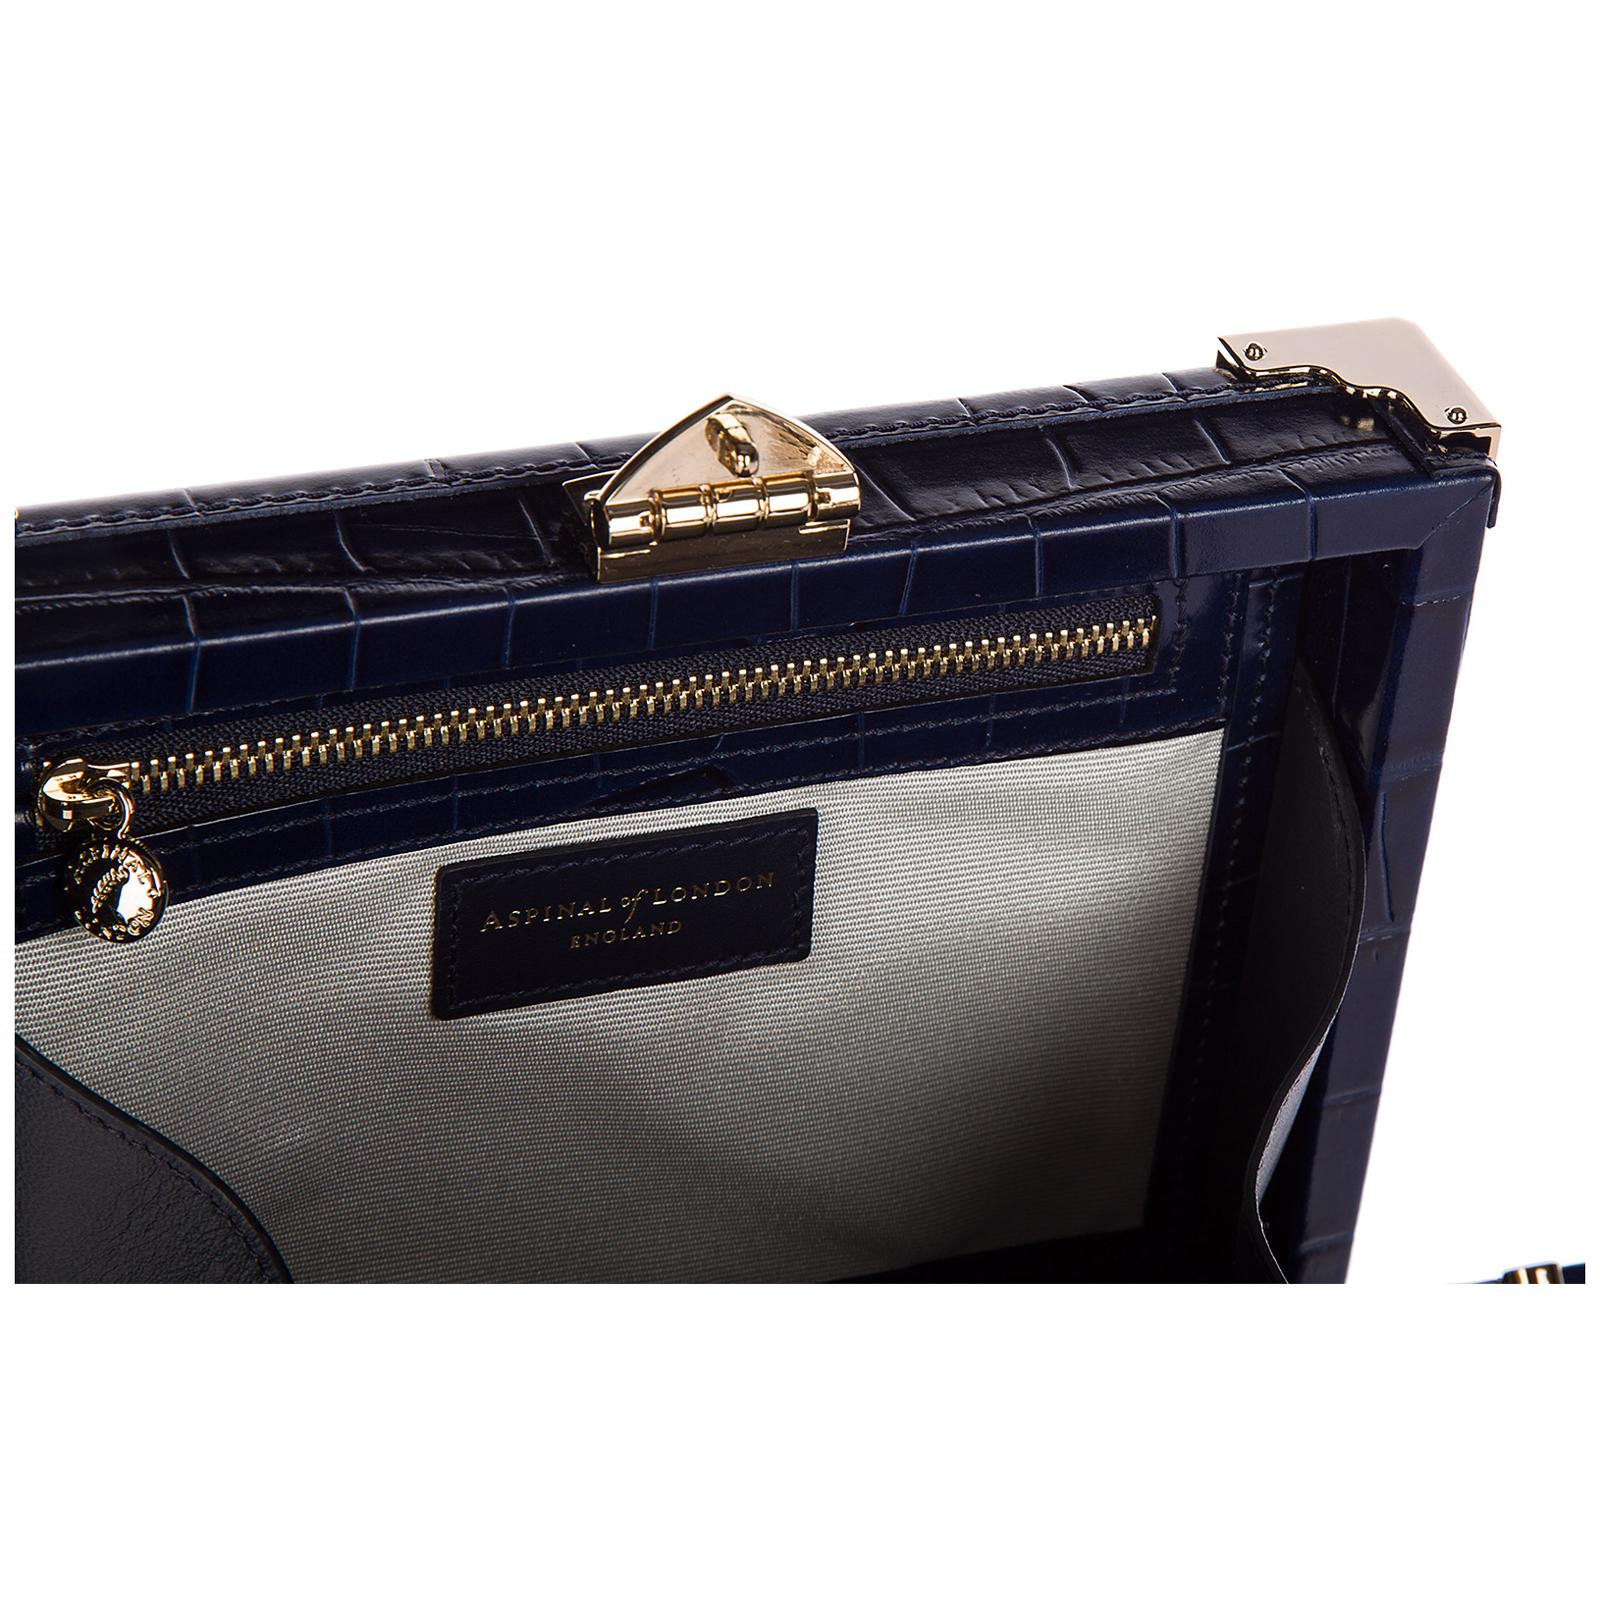 Pochette handtasche damen tasche leder clutch bag  trunk